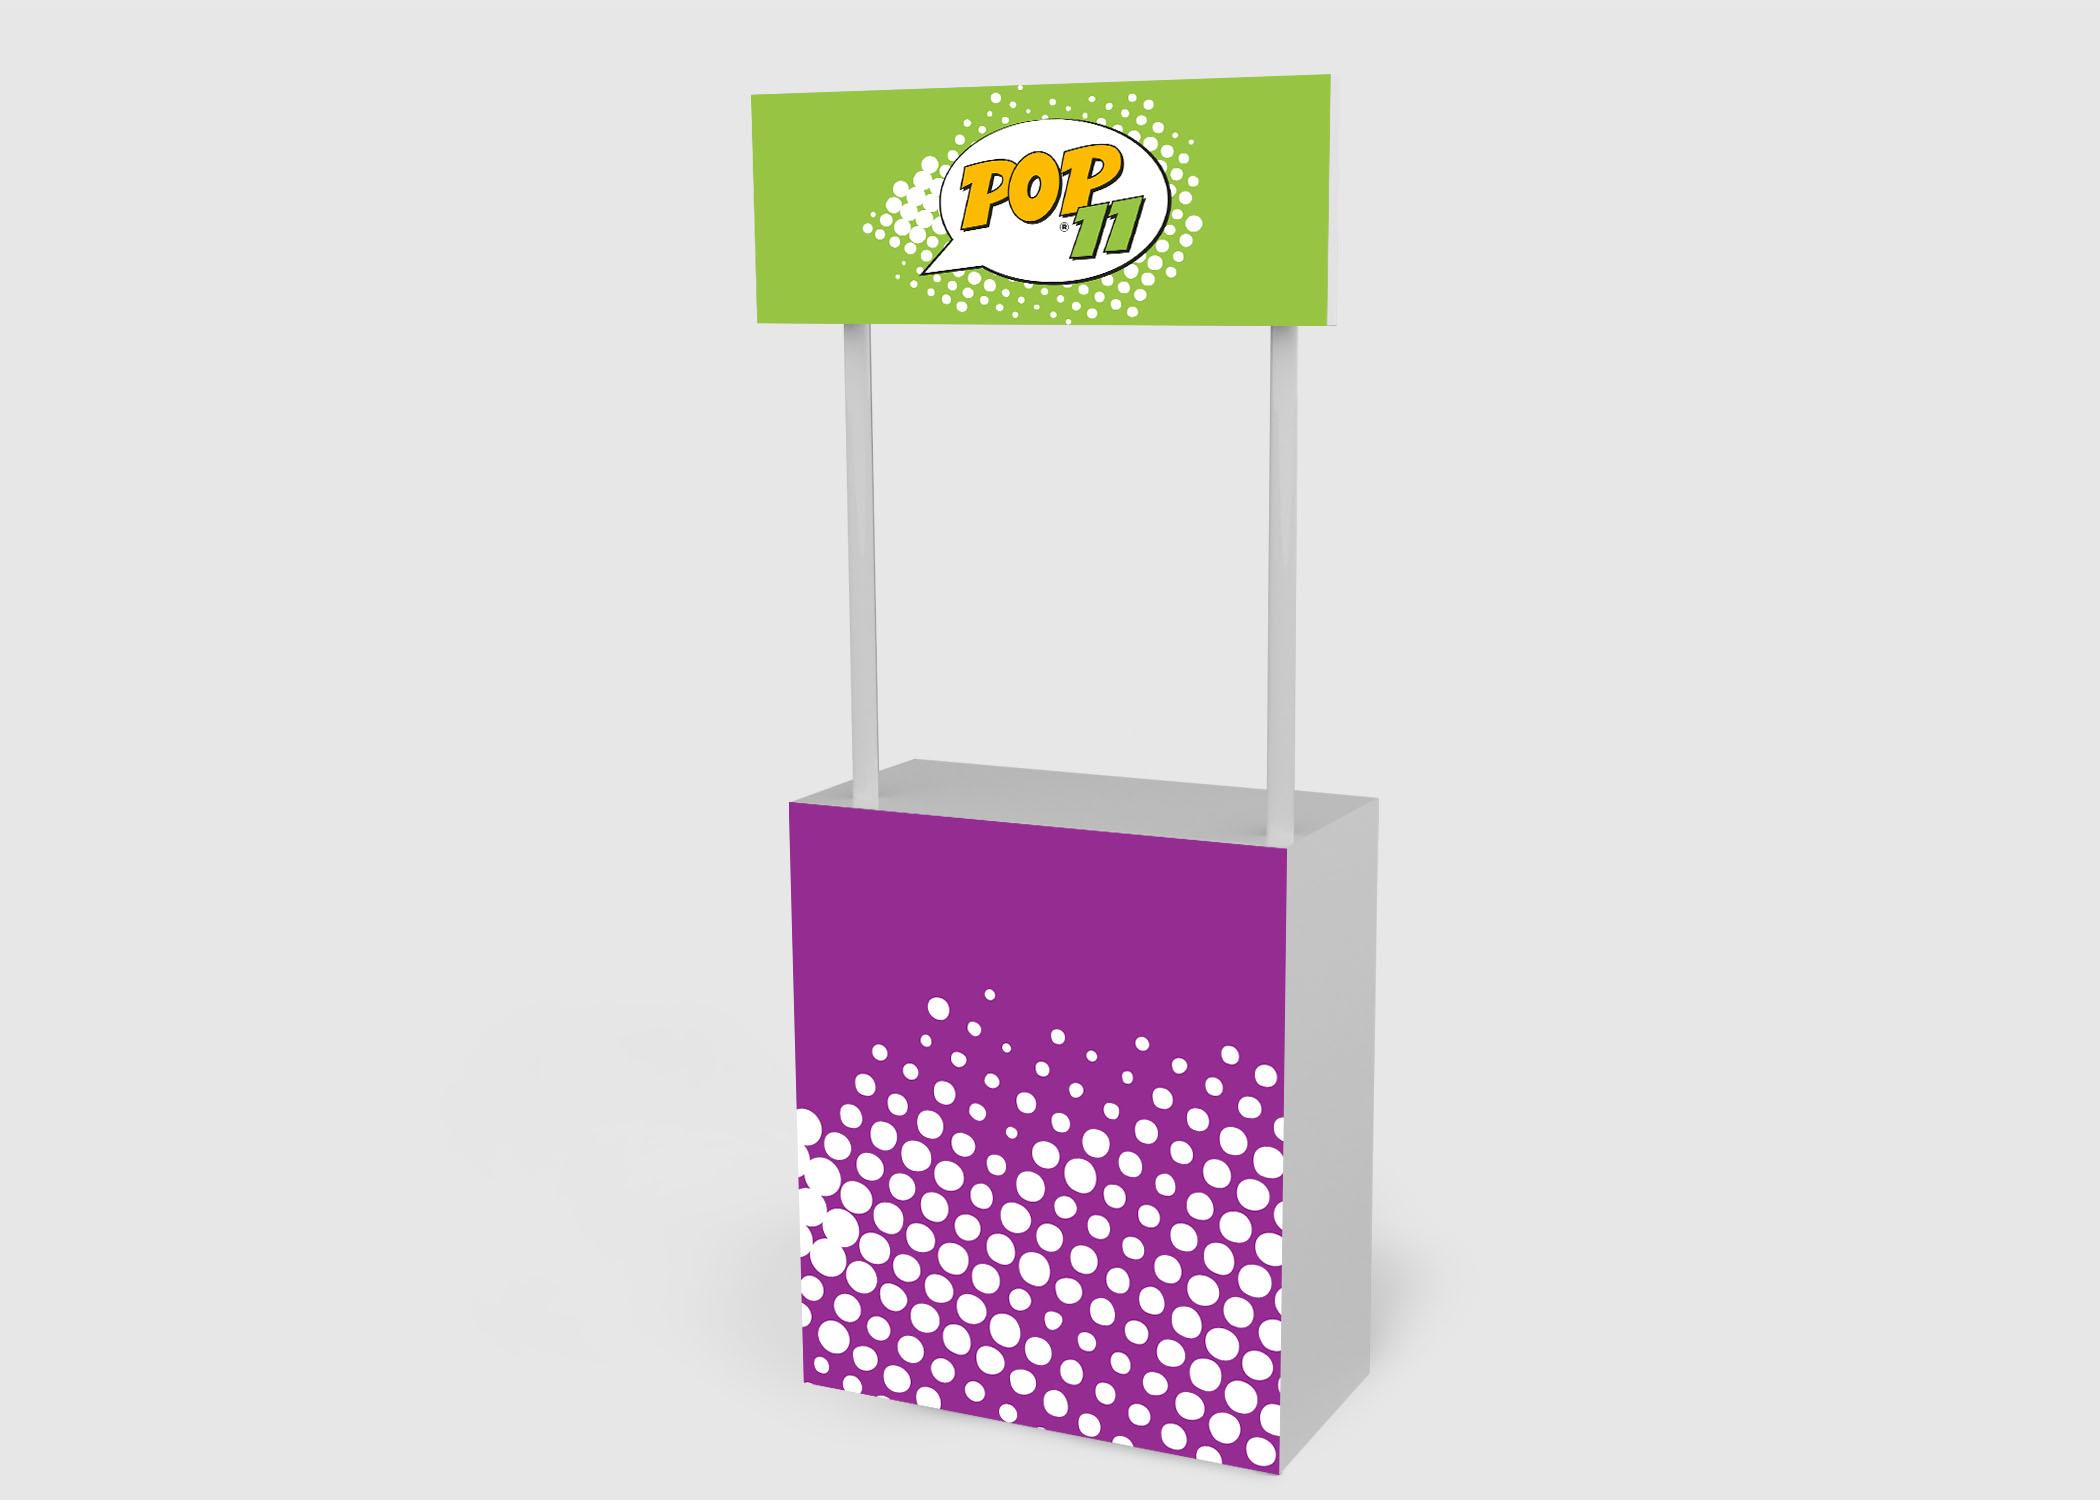 02 Promo Stand Pop11 Digital Prints